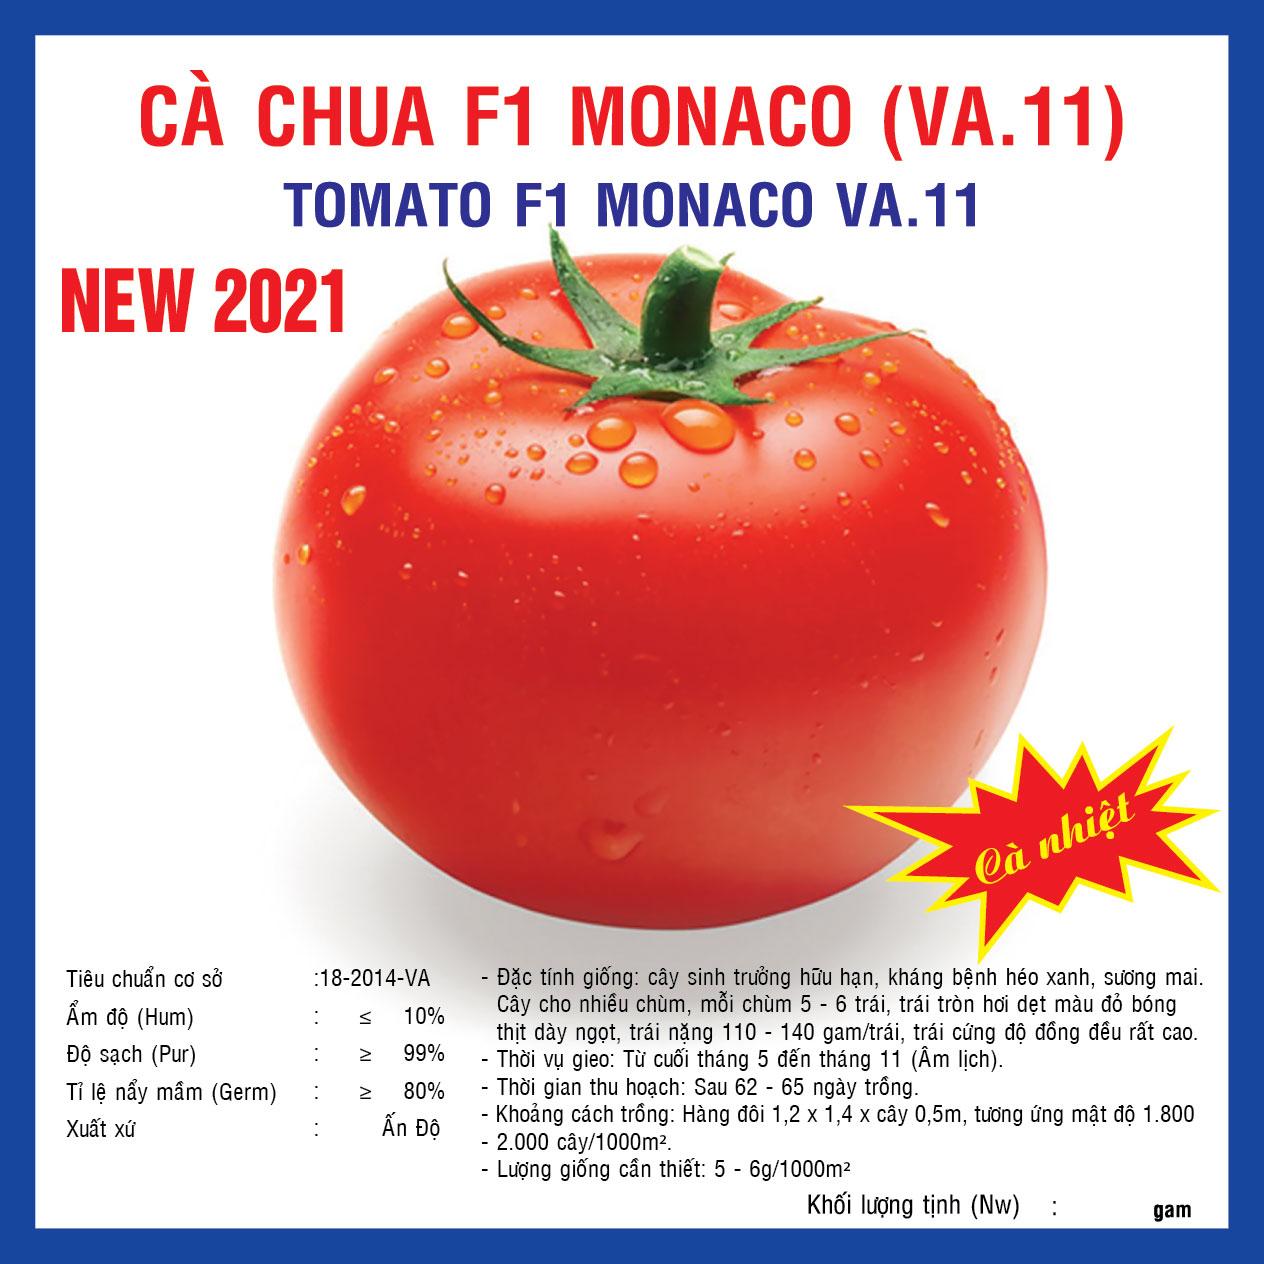 CÀ CHUA F1 MONACO (VA.11) 100 Hạt